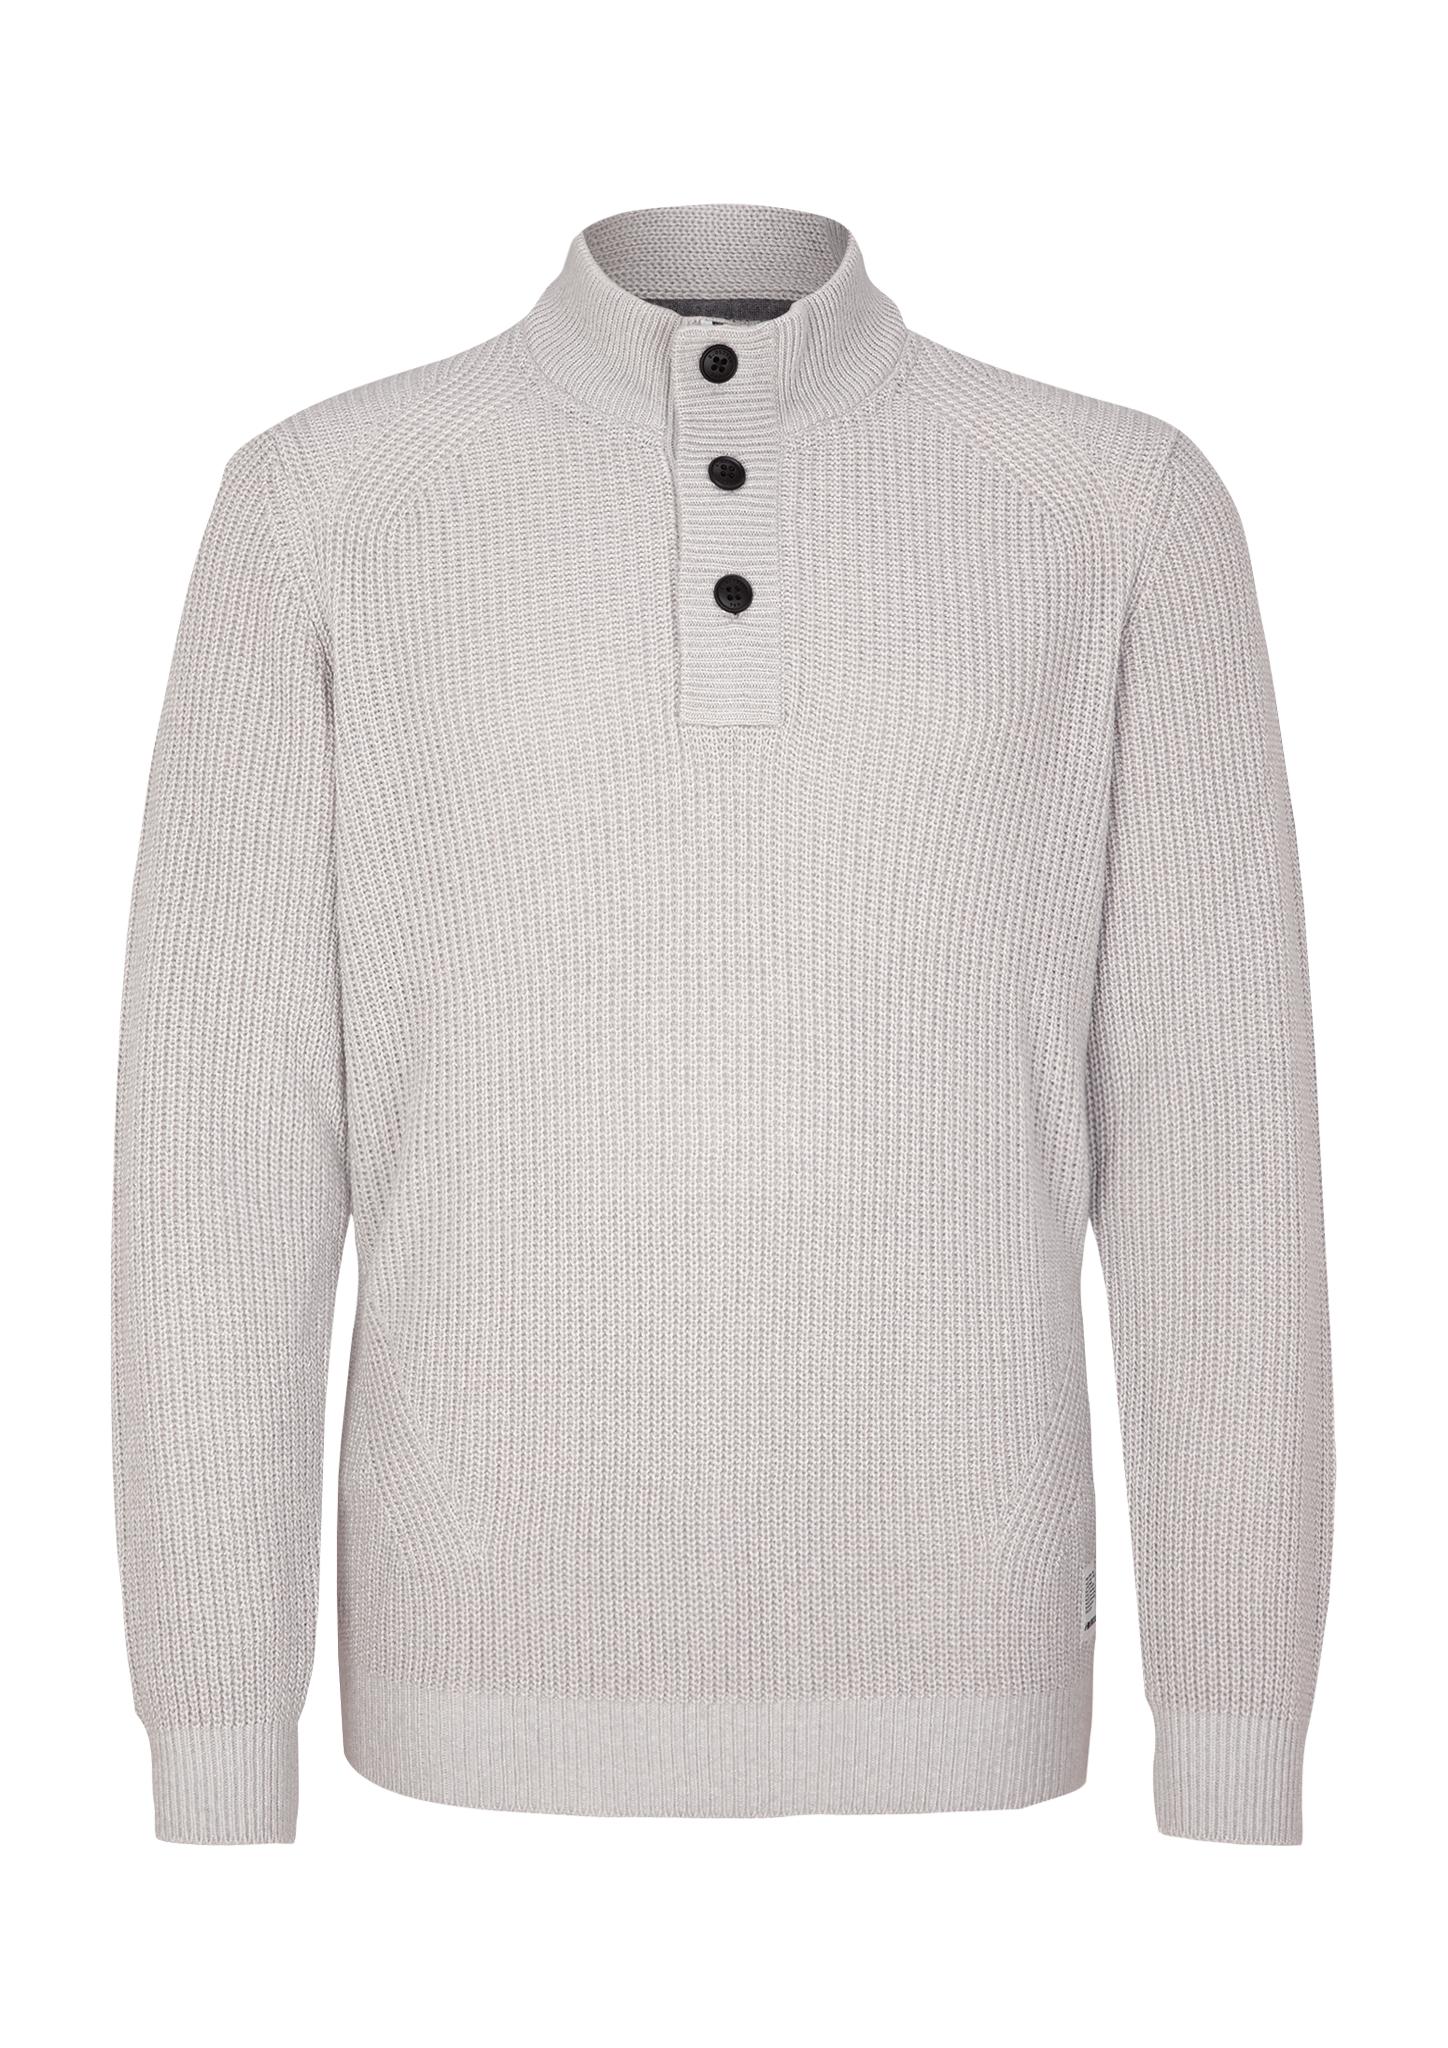 Troyer   Bekleidung > Pullover > Troyer   Weiß   52% baumwolle -  48% polyacryl   s.Oliver Men Big Sizes